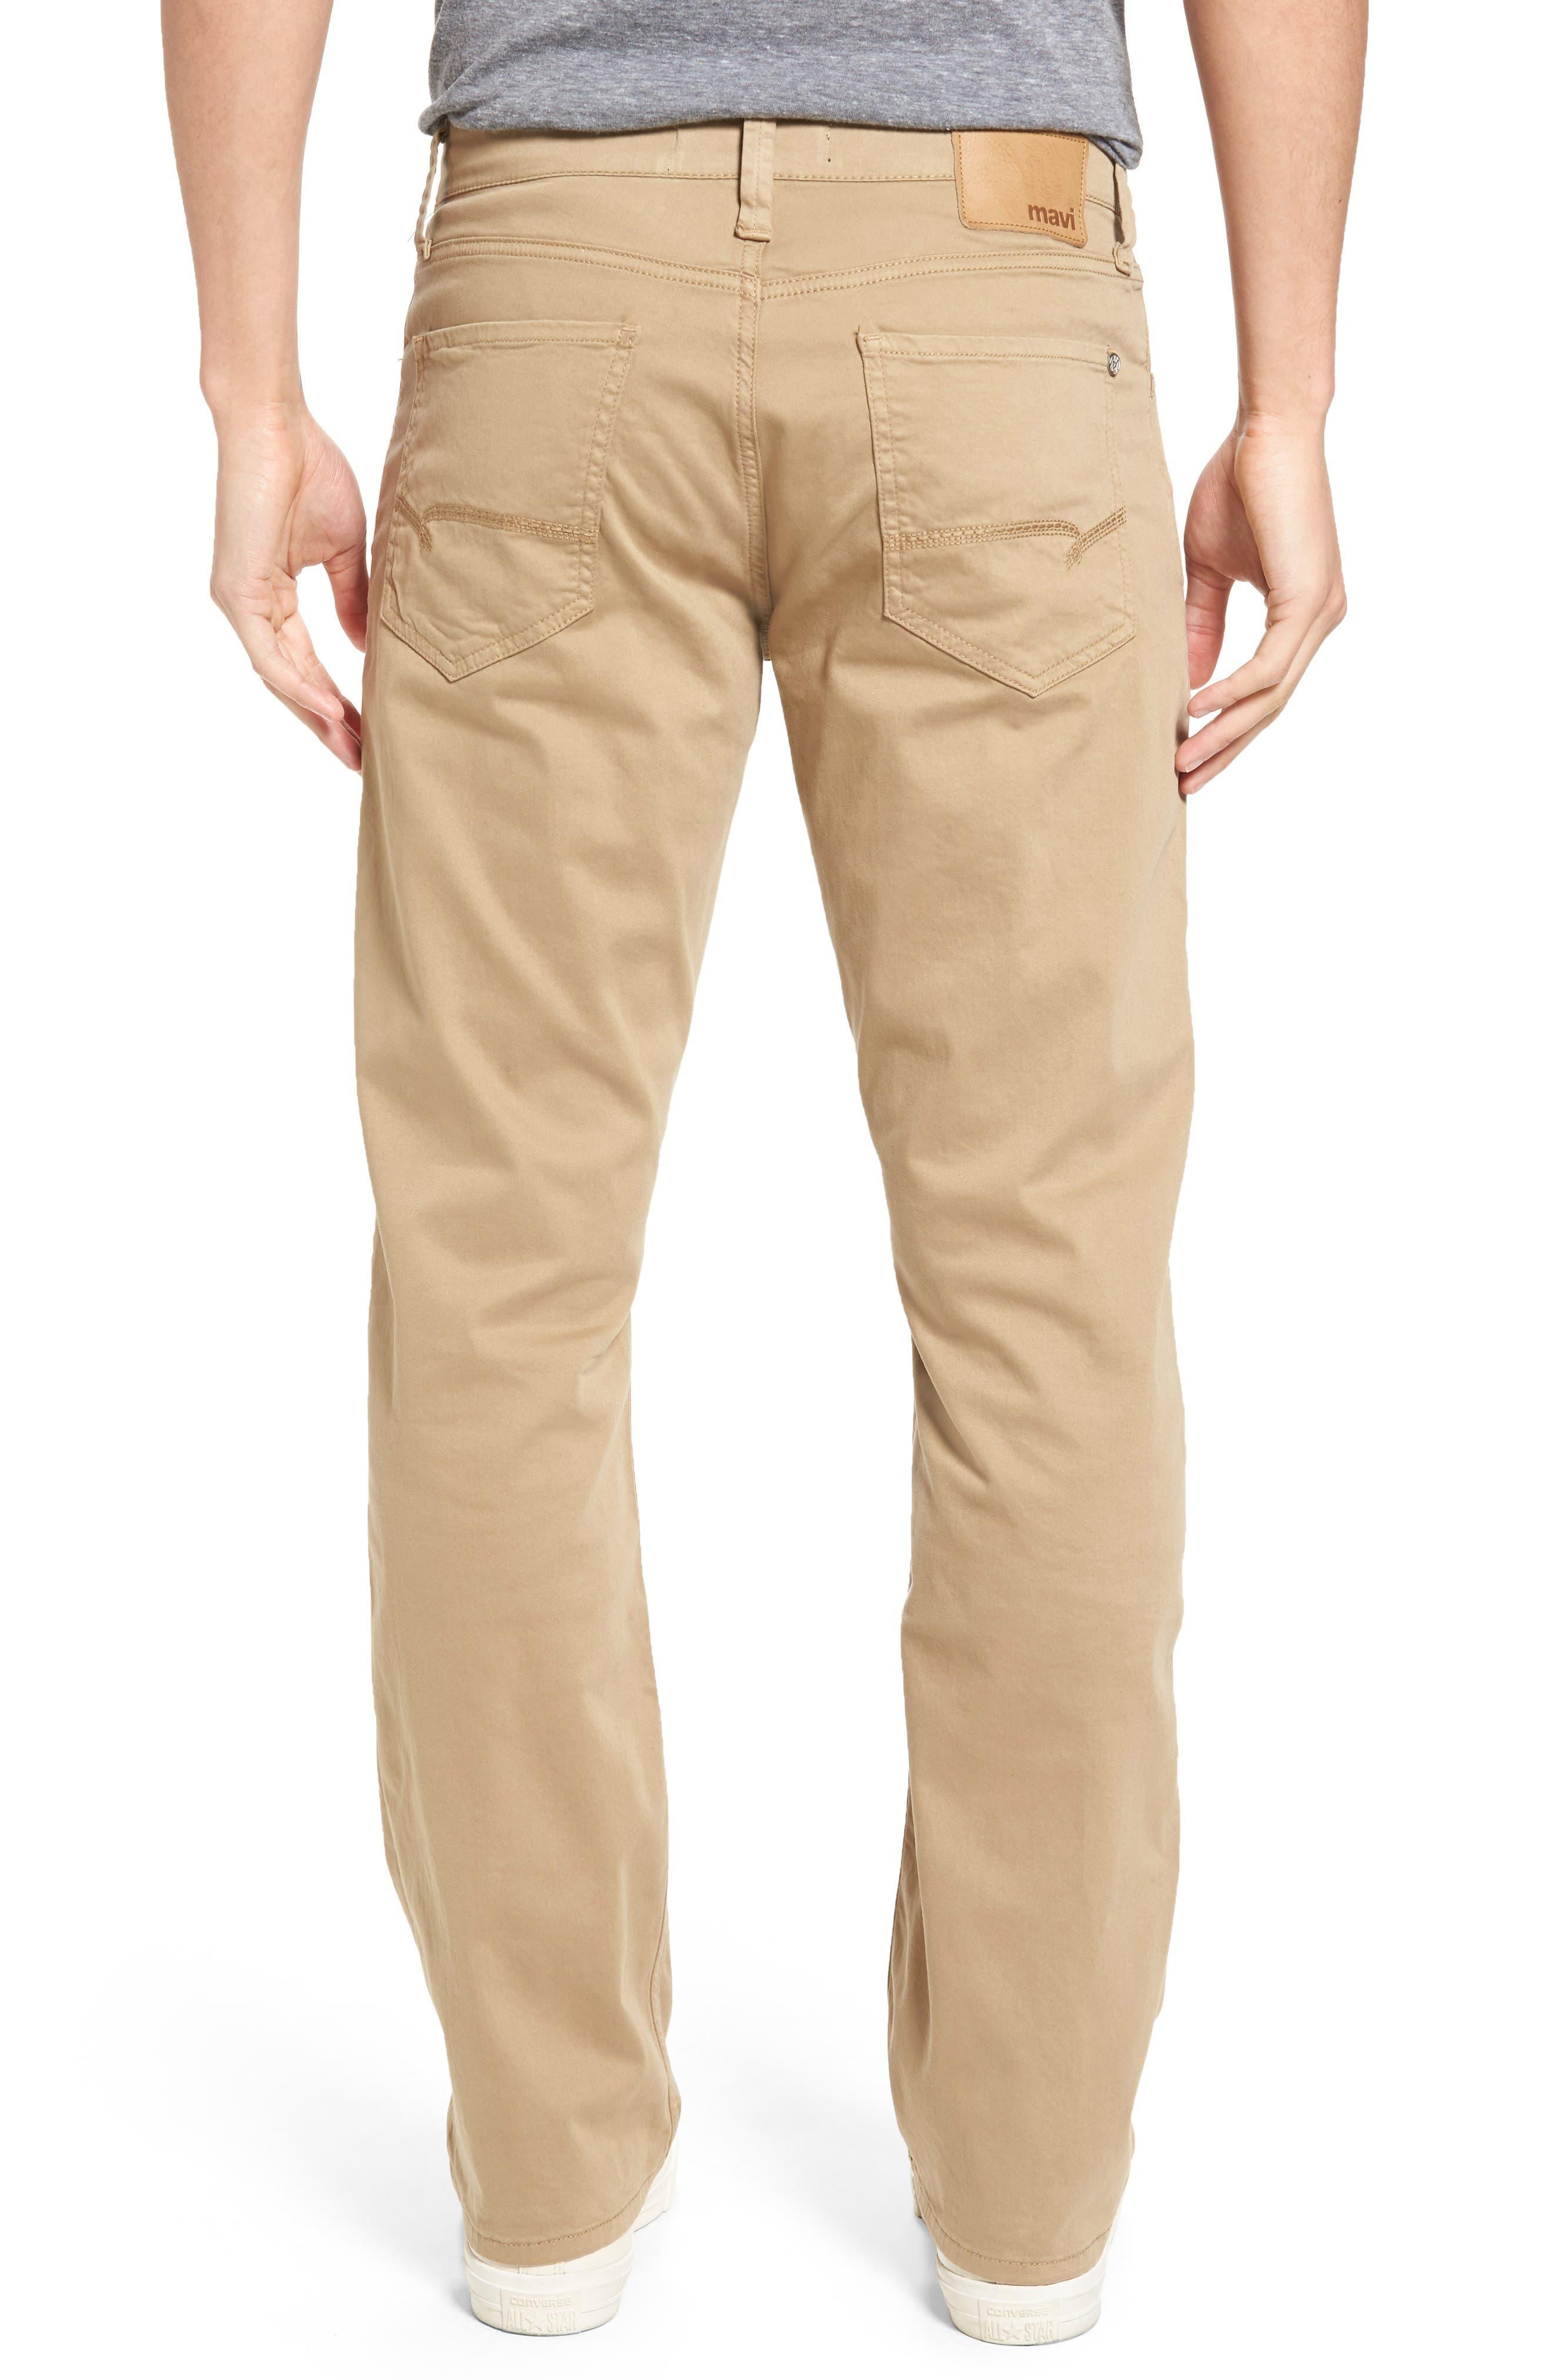 Matt Relaxed Fit Jeans,                             Alternate thumbnail 2, color,                             British Khaki Twill